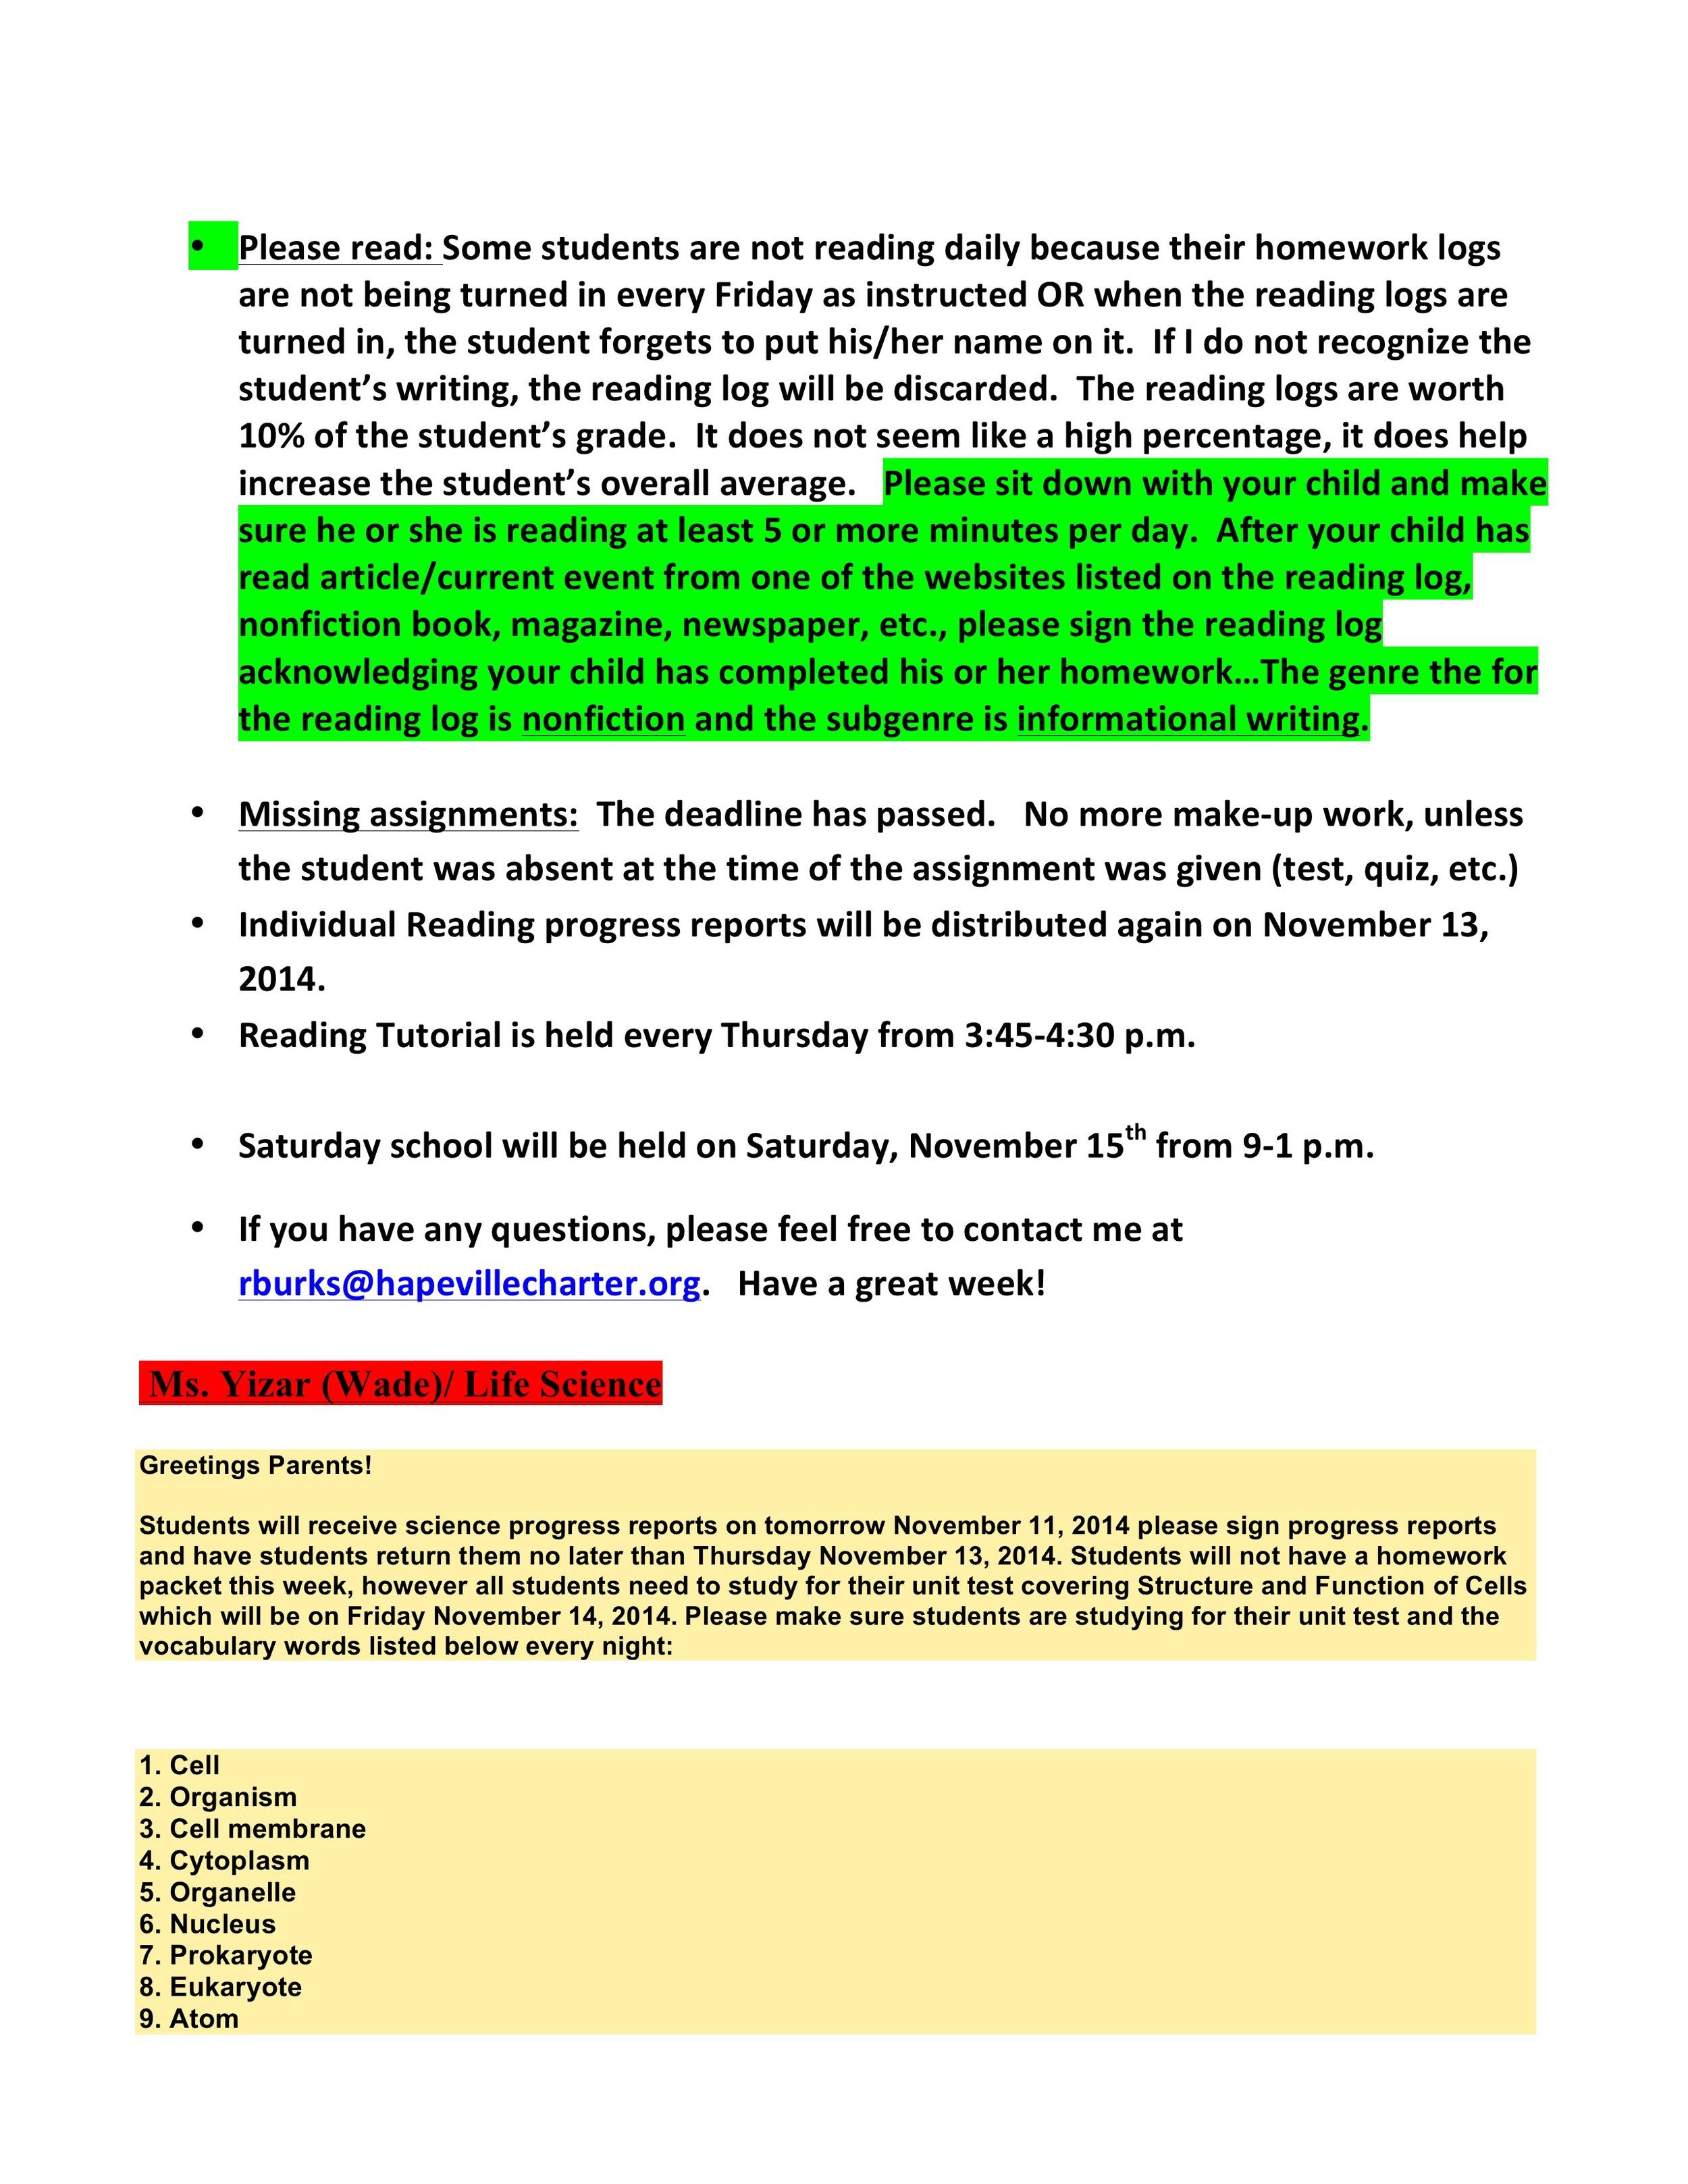 Newsletter Image7th grade nov 10-14 3.jpeg